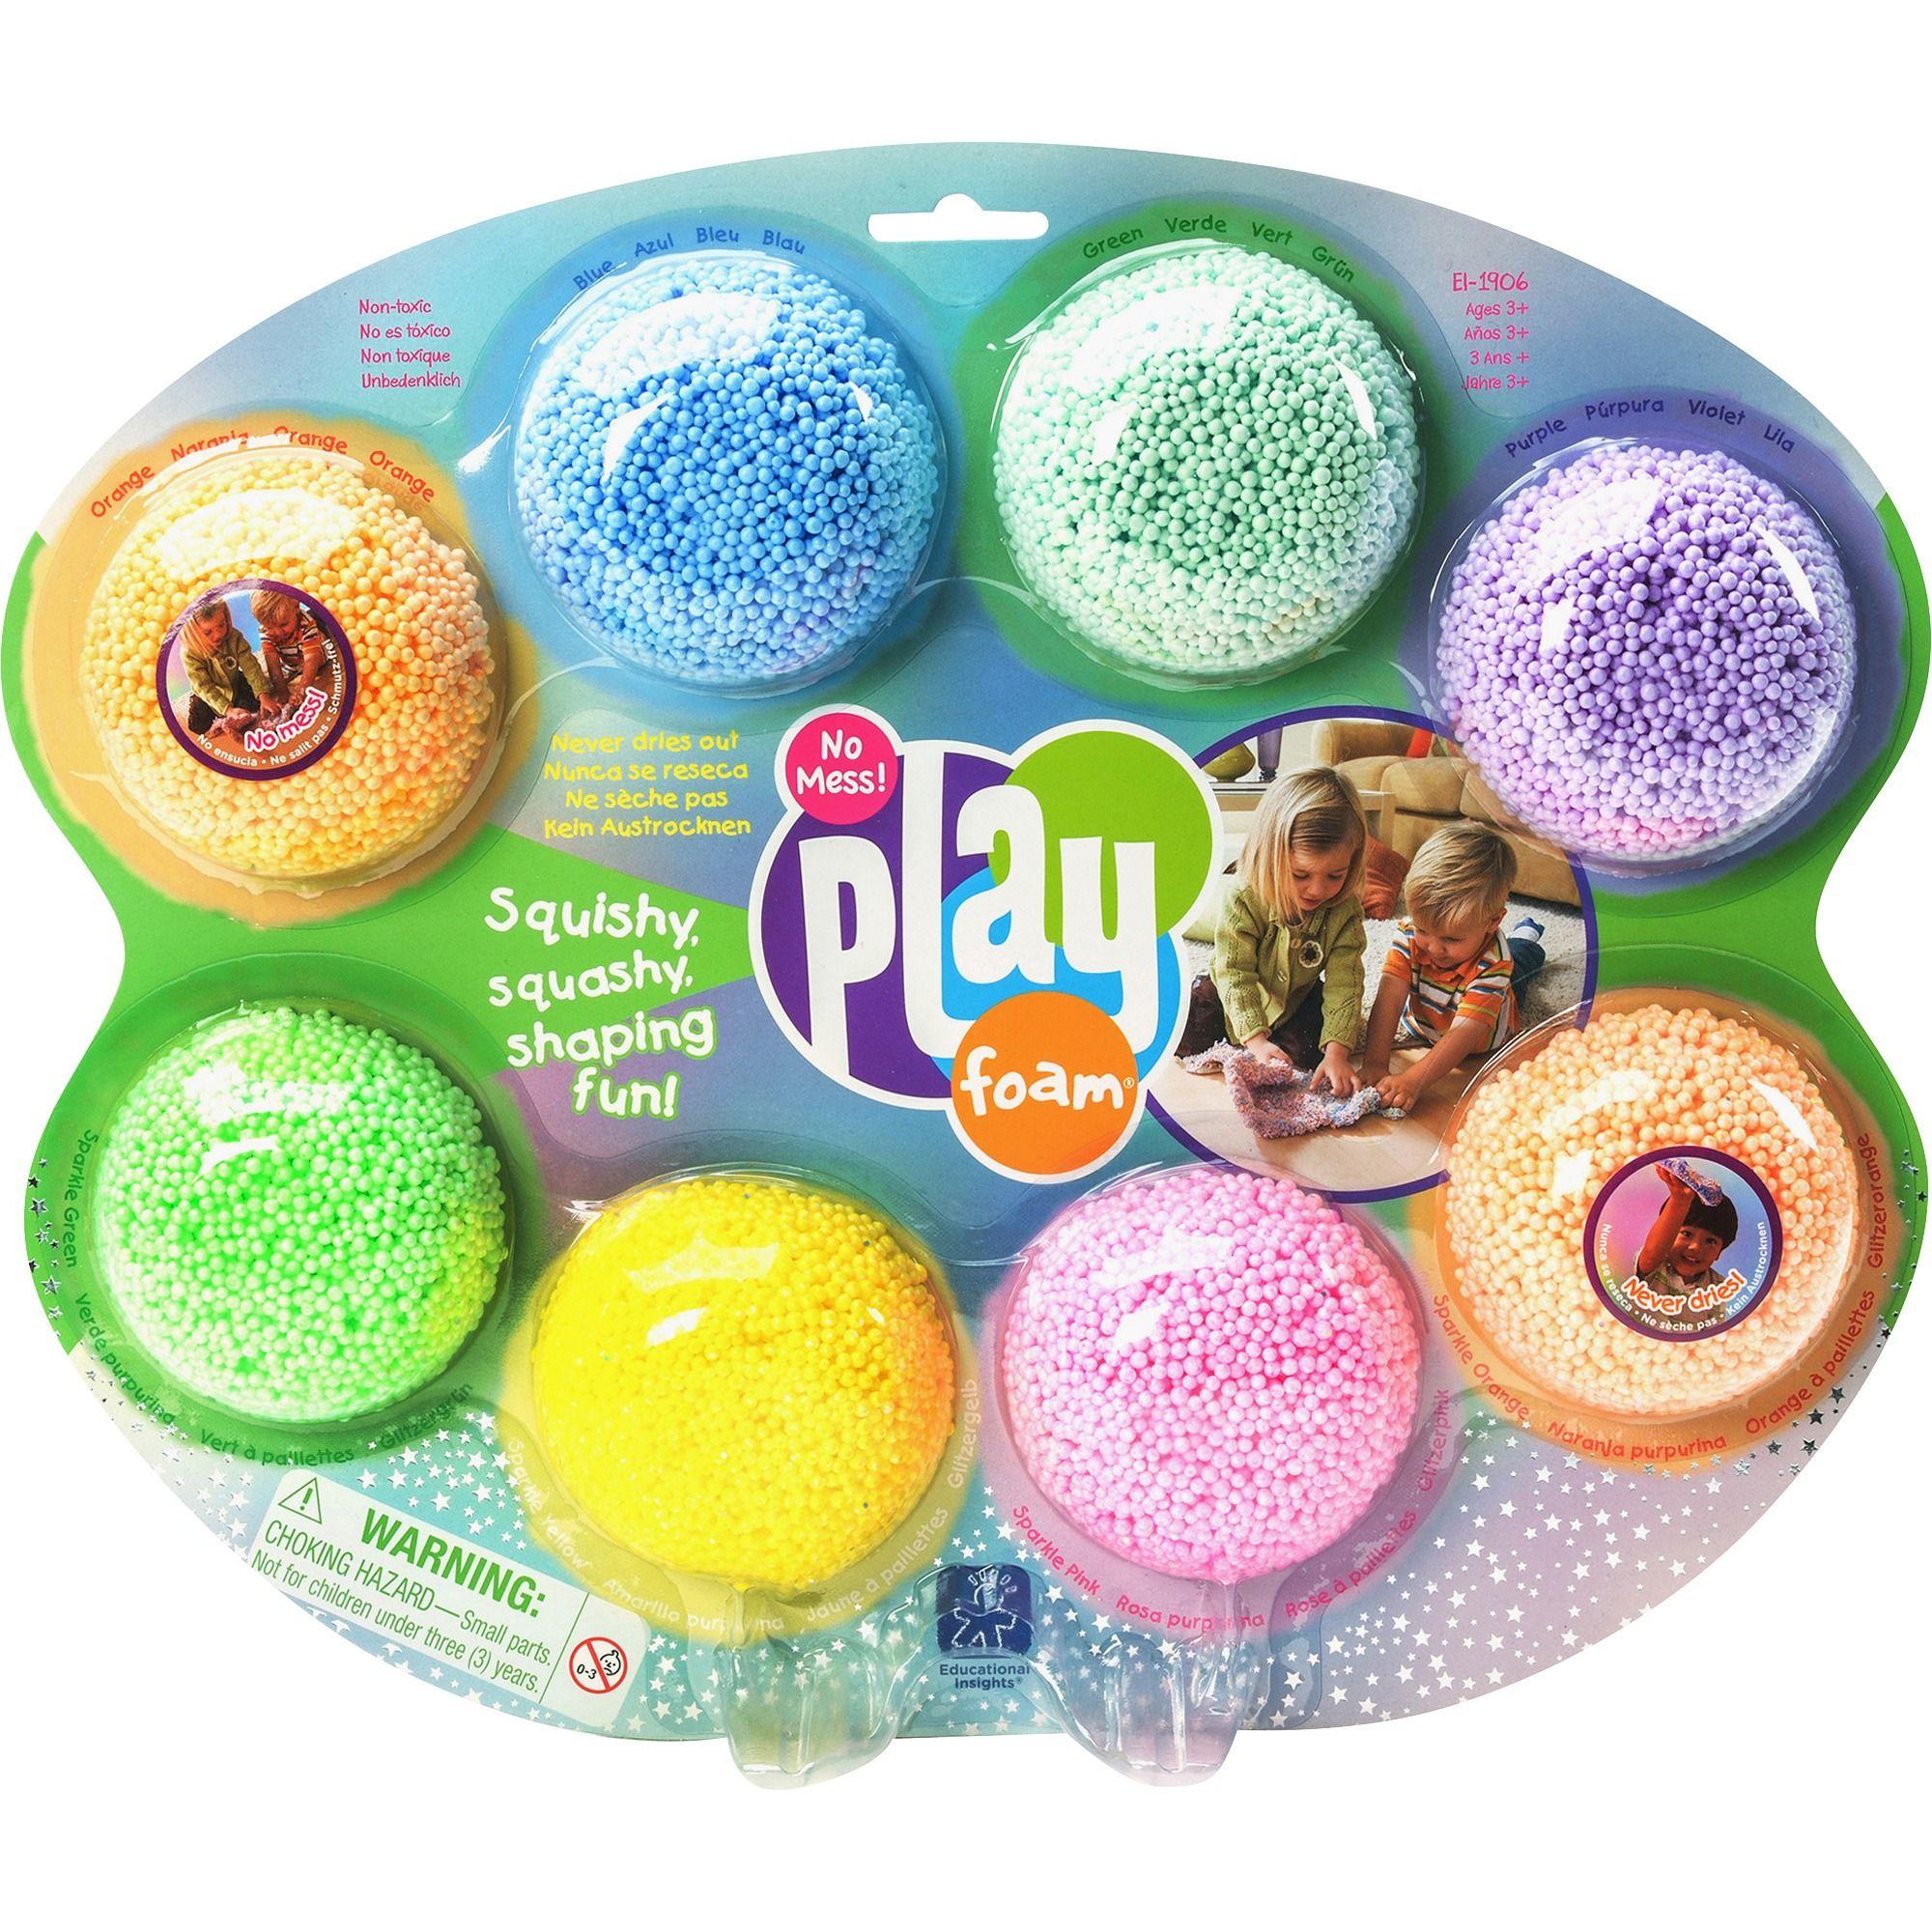 Toys Sensory toys, Cool toys, Diy moon sand